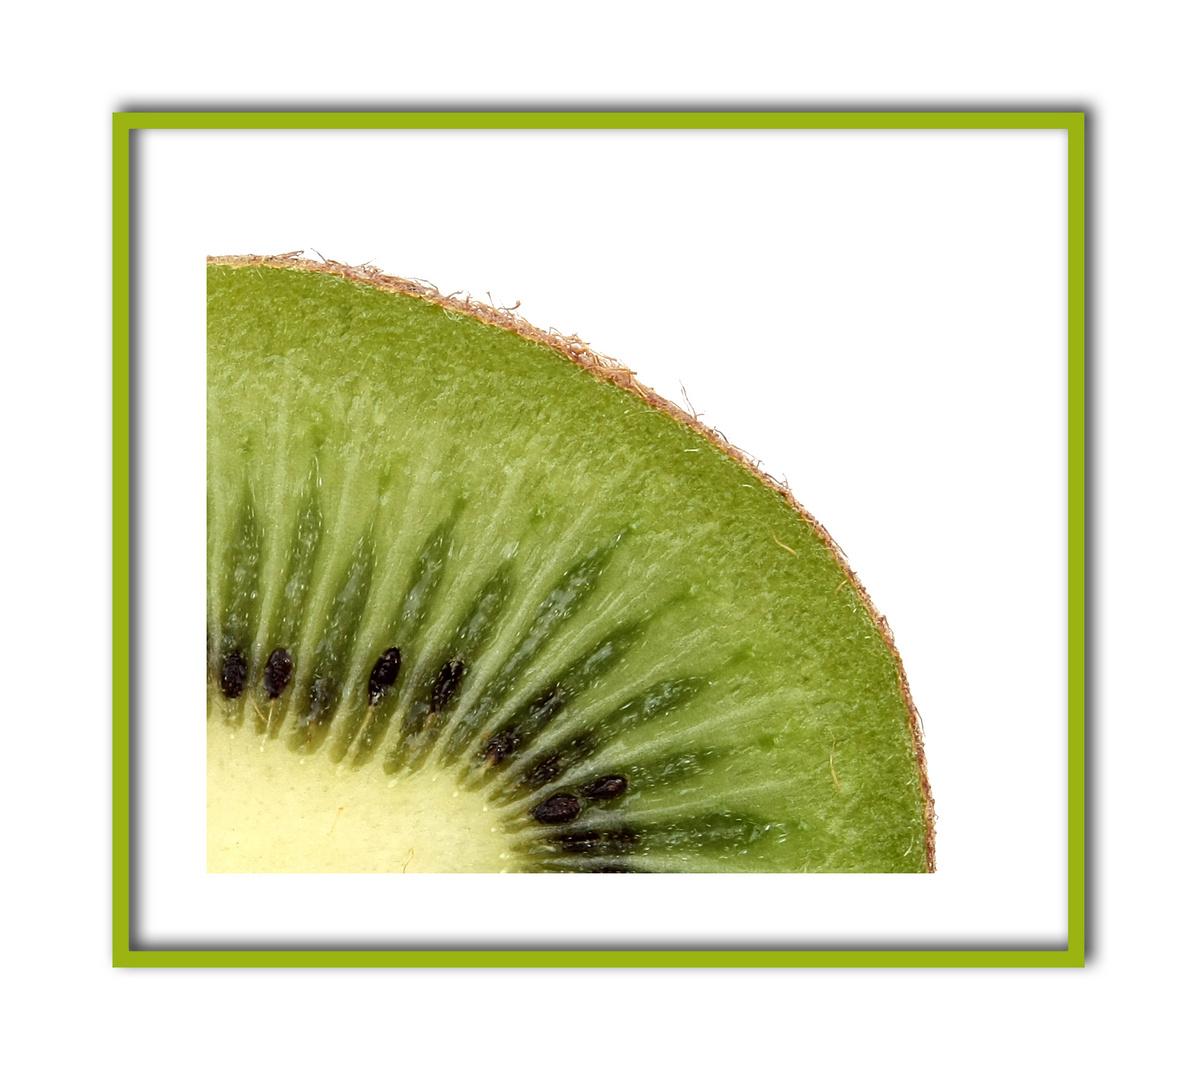 *fruchtig*